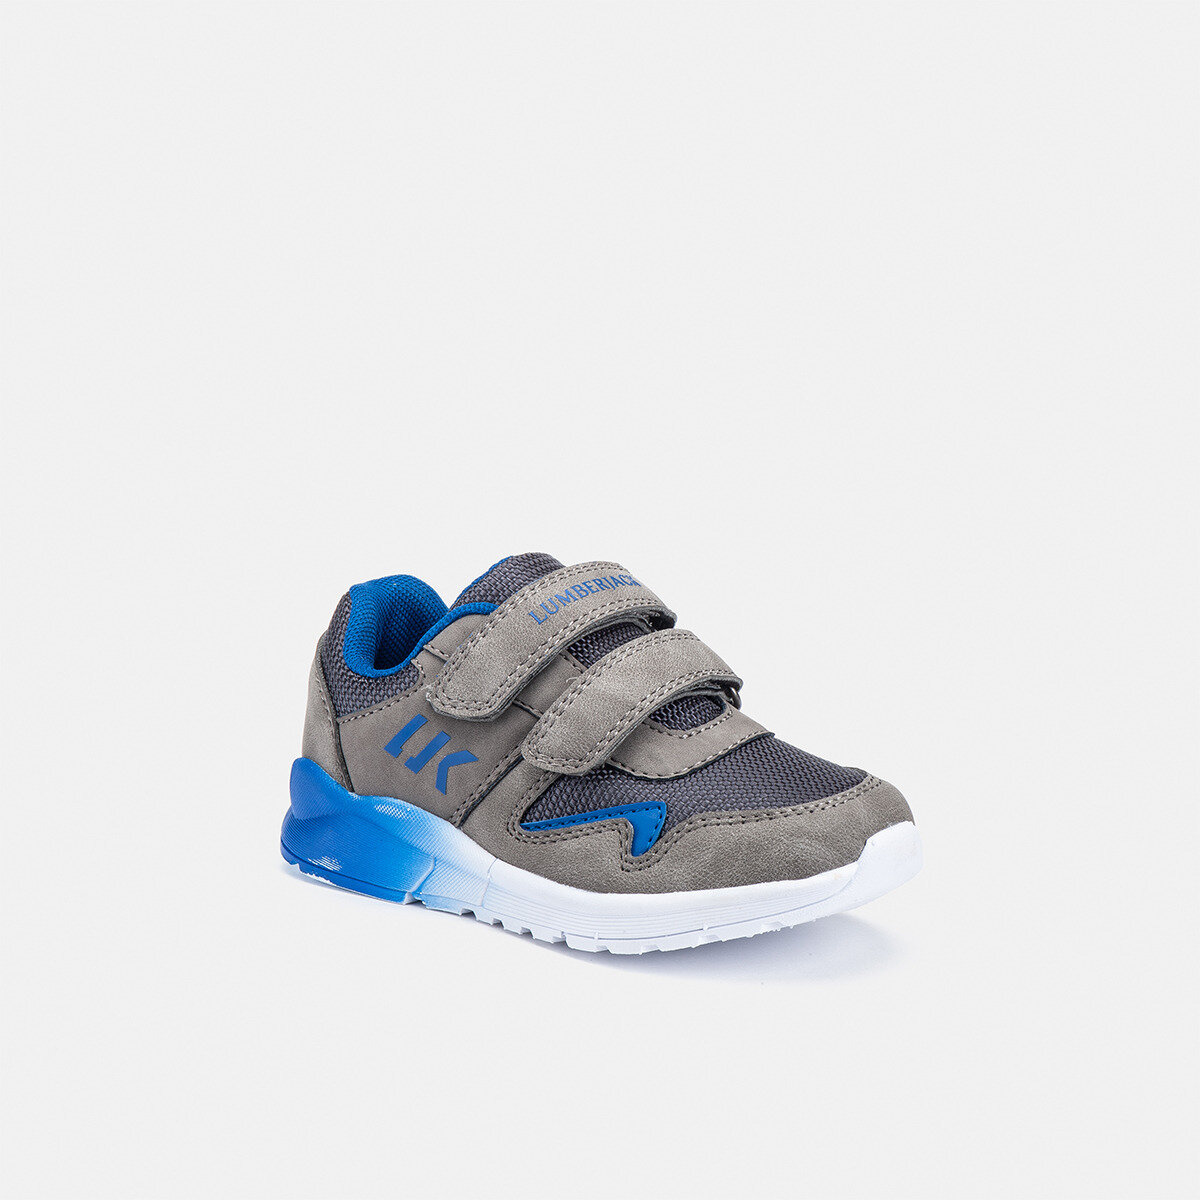 SWING GREY/ROYAL BLUE Boy Sneakers